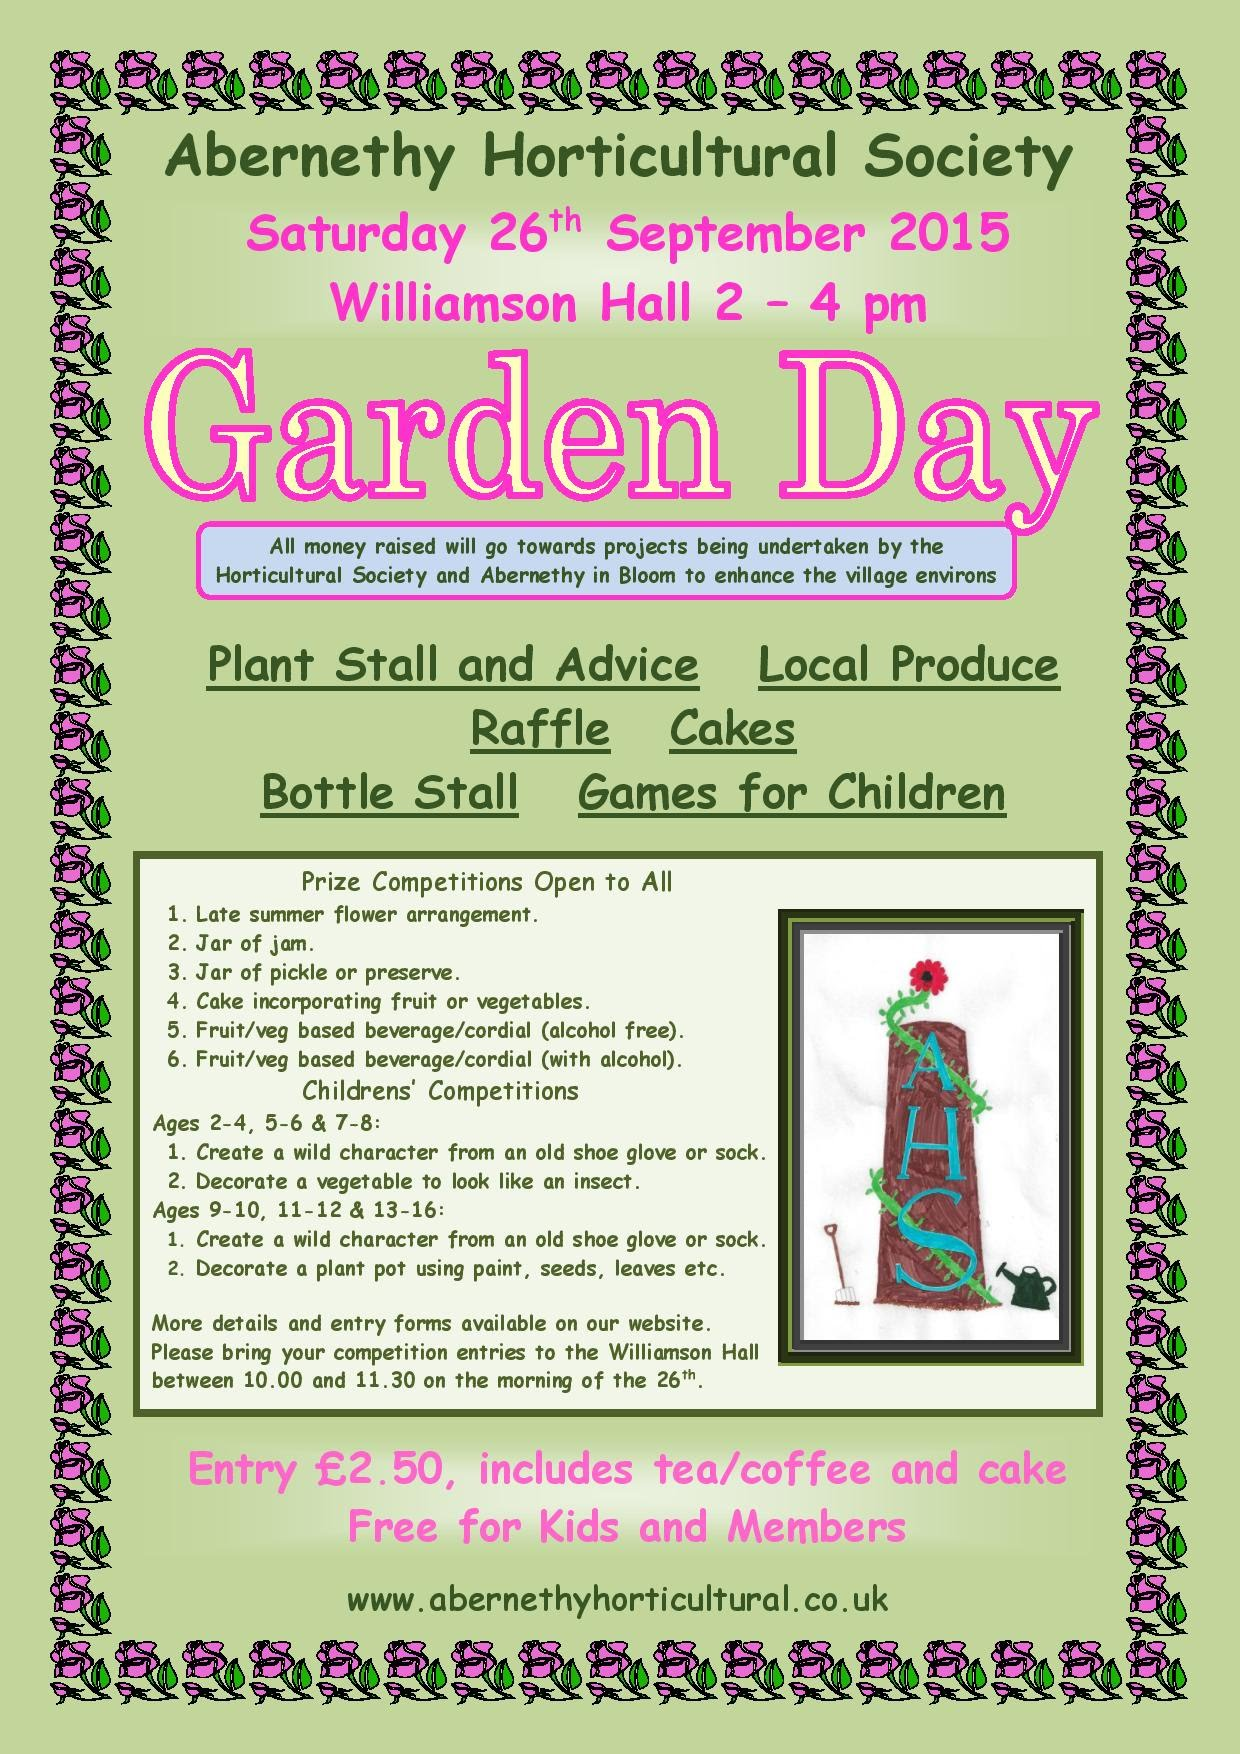 Garden Day Poster 2015